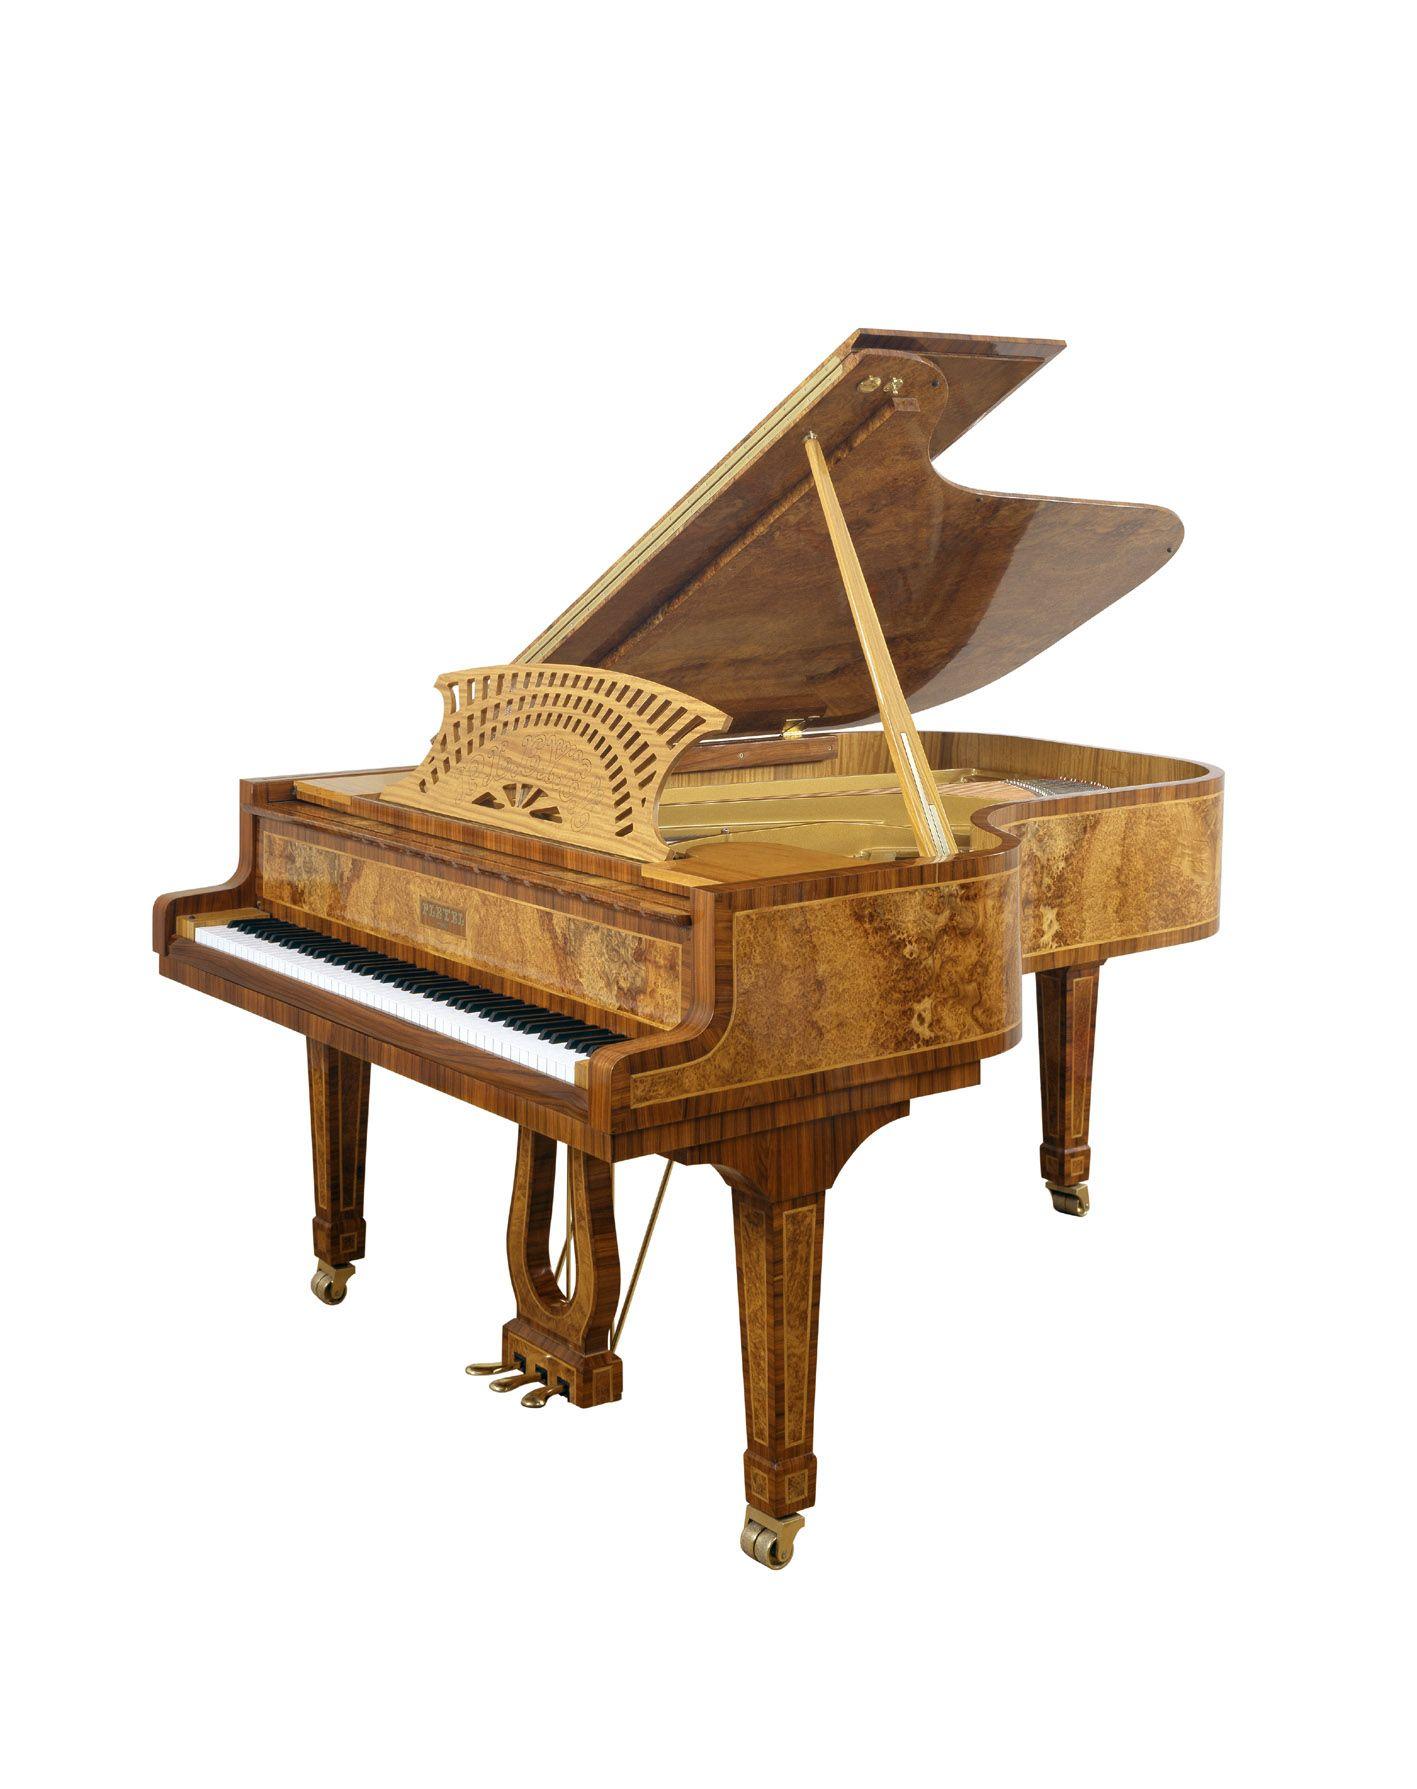 Vue 3 4 du piano Pleyel unique Loupe d amboine Piano